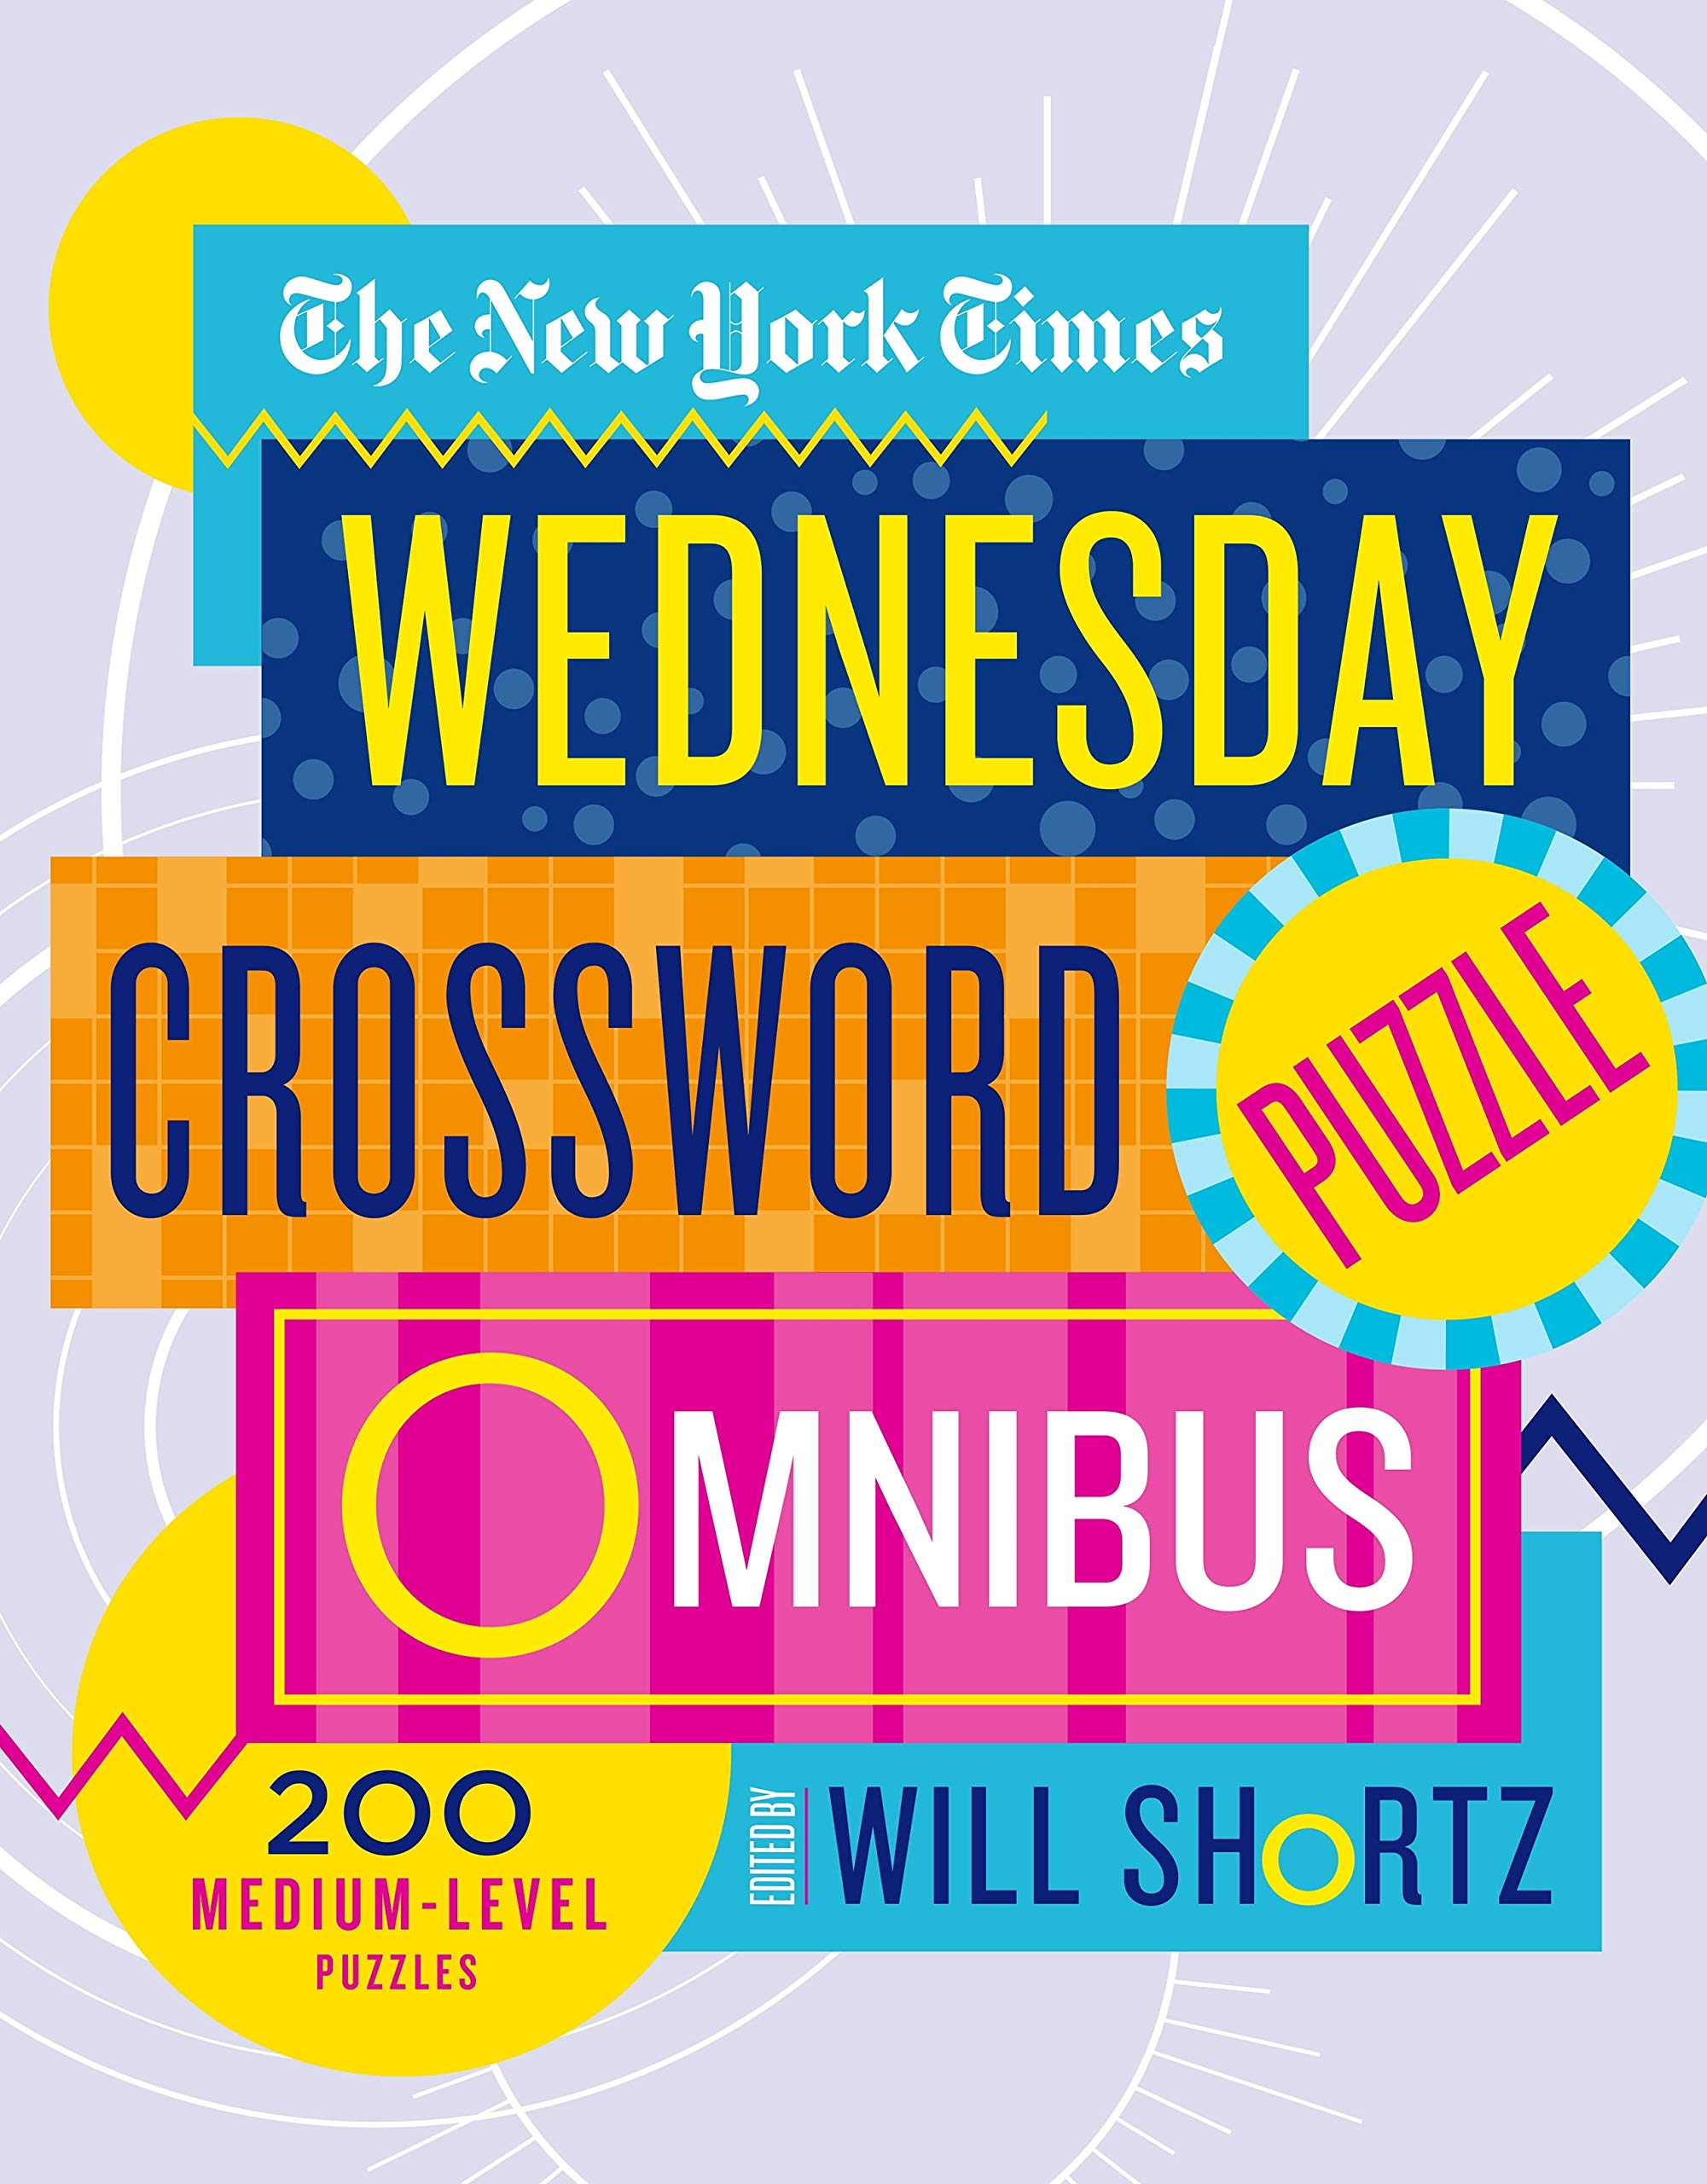 The New York Times Wednesday Crossword Puzzle Omnibus